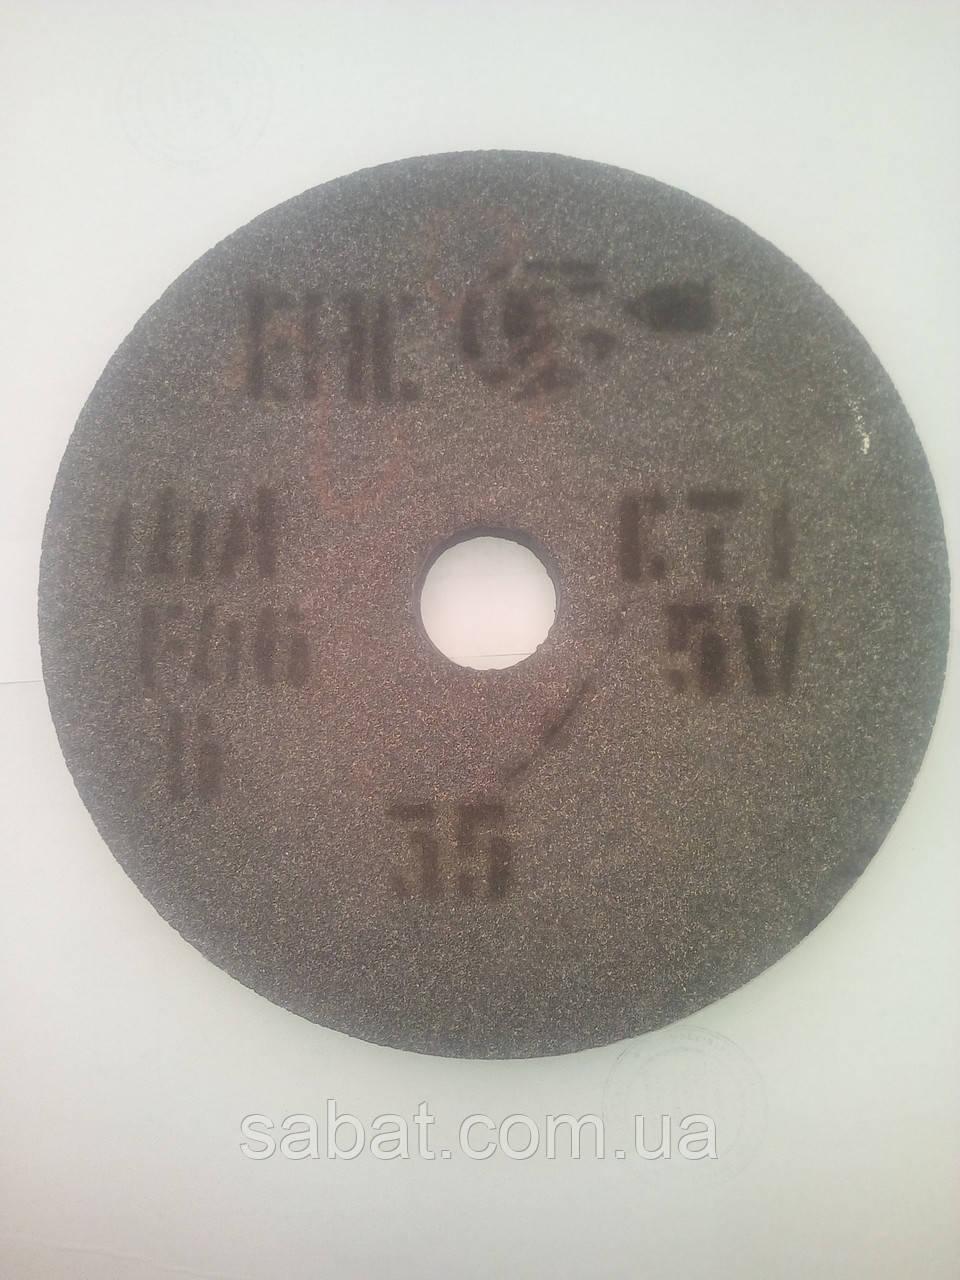 Круг шлифовальный 14А F46-80 СТ- СМ 250х25х32